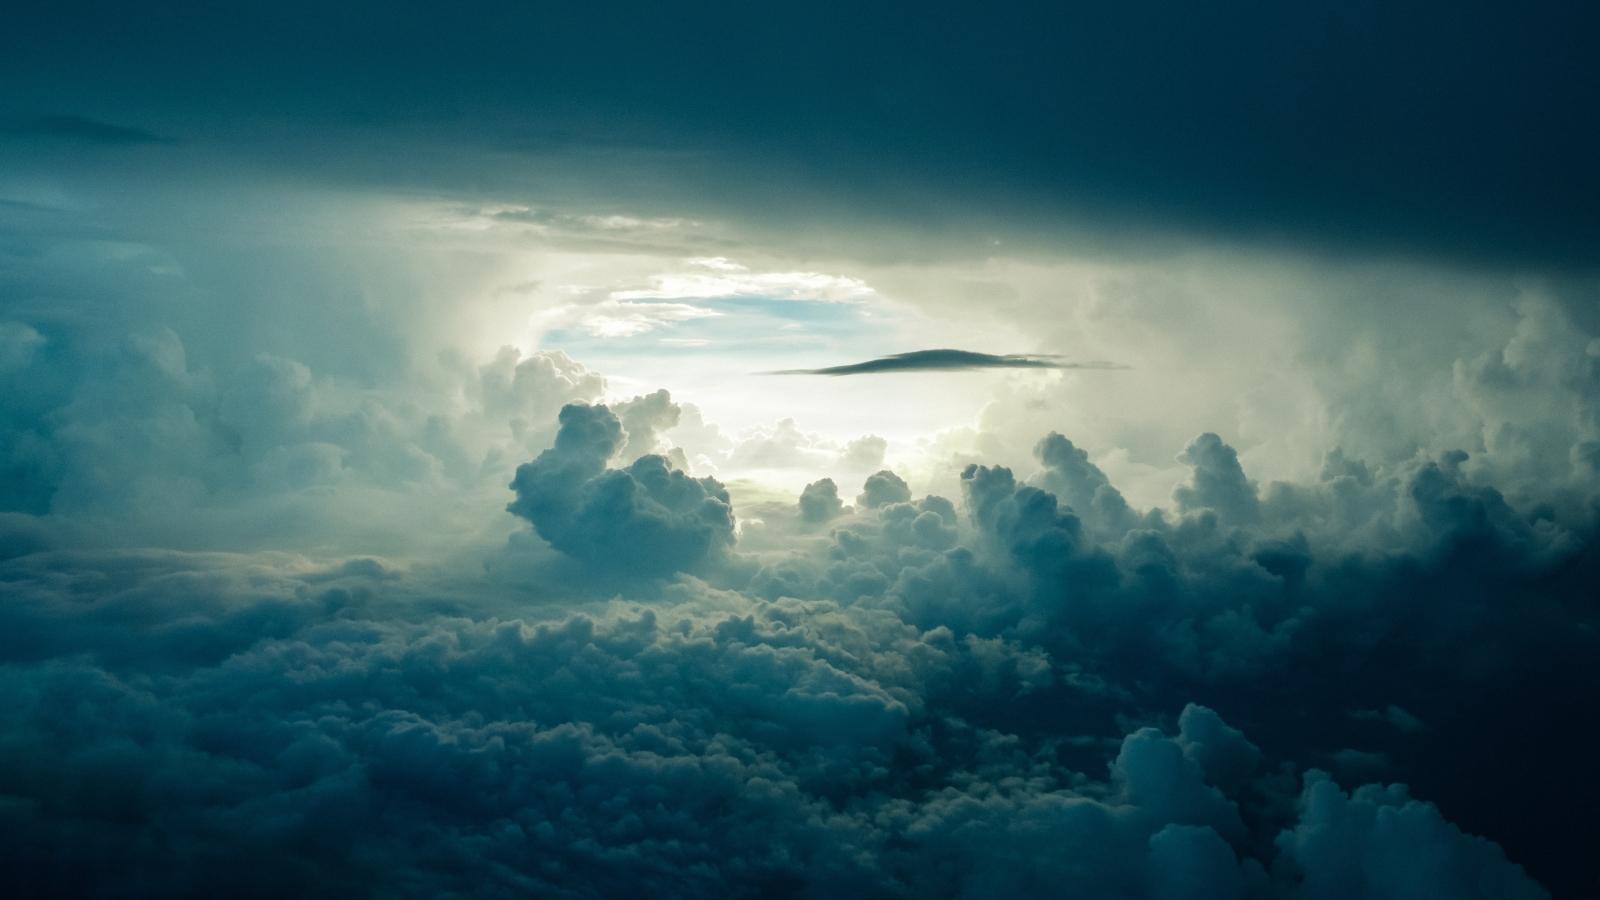 Clouds 4K 1600x900 Resolution Wallpaper